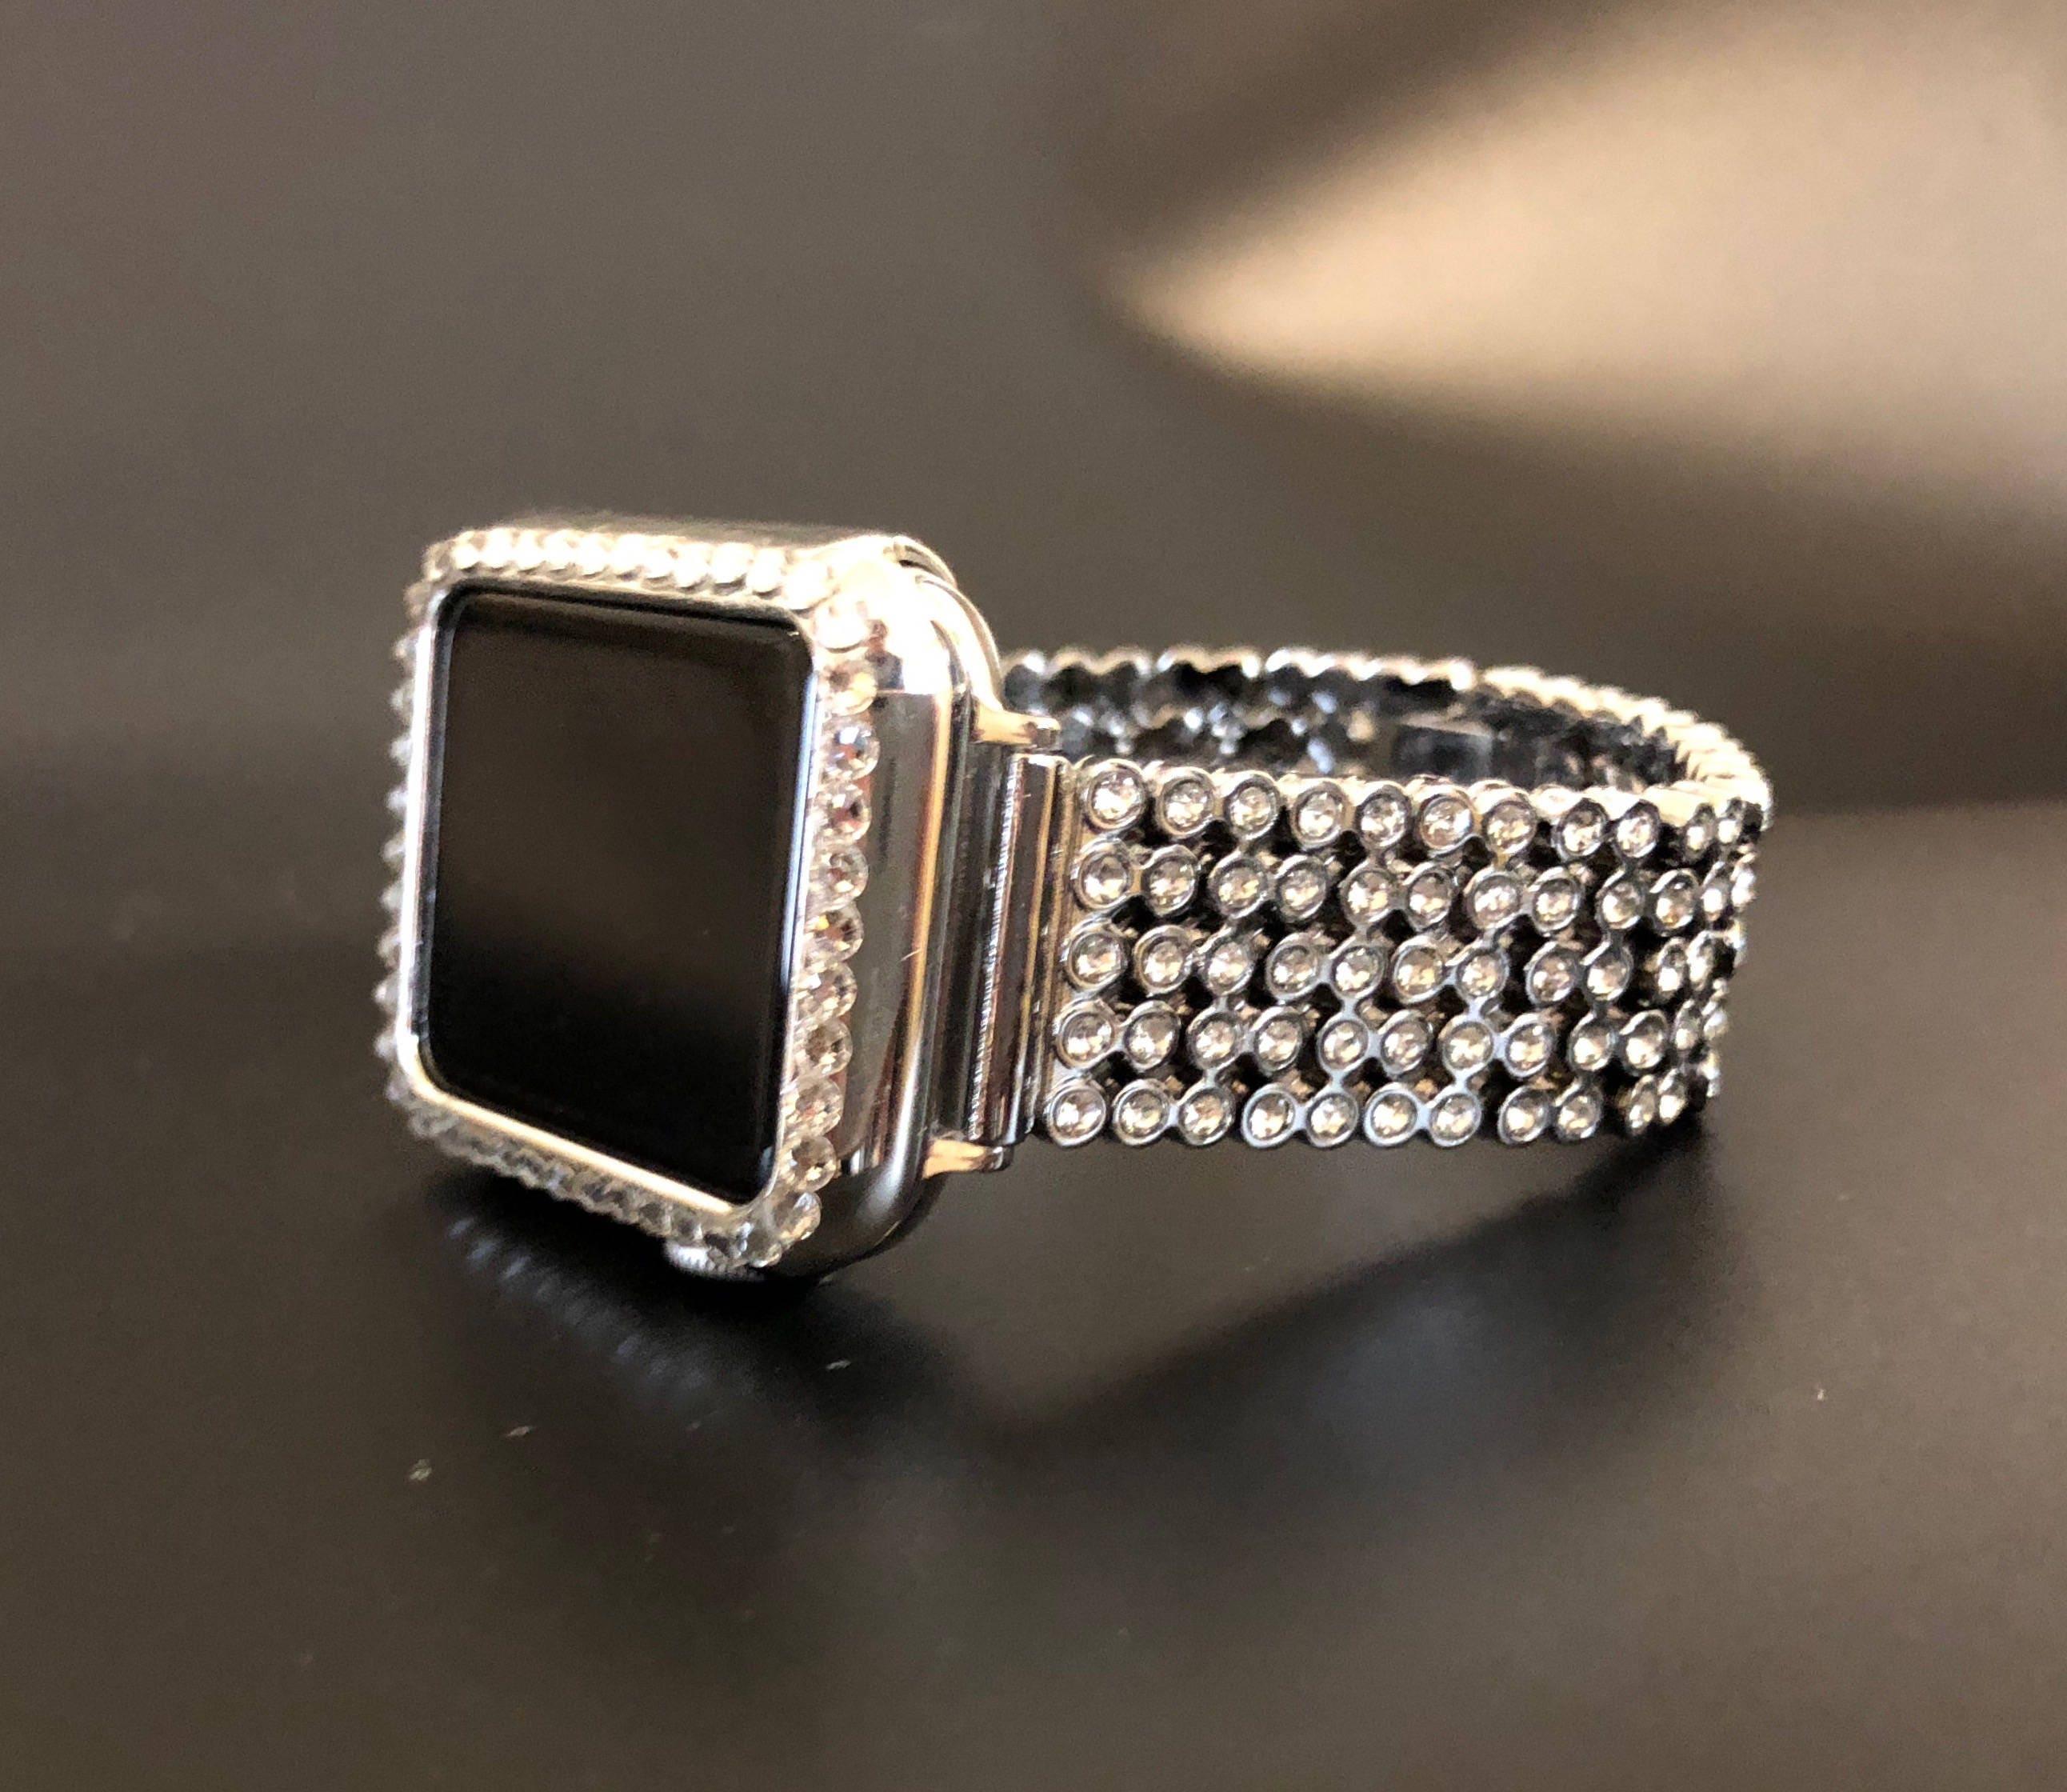 meet 7287d ba307 Apple Watch Band 38mm 42mm Series 1,2,3 Women's Silver Rhinestone ...